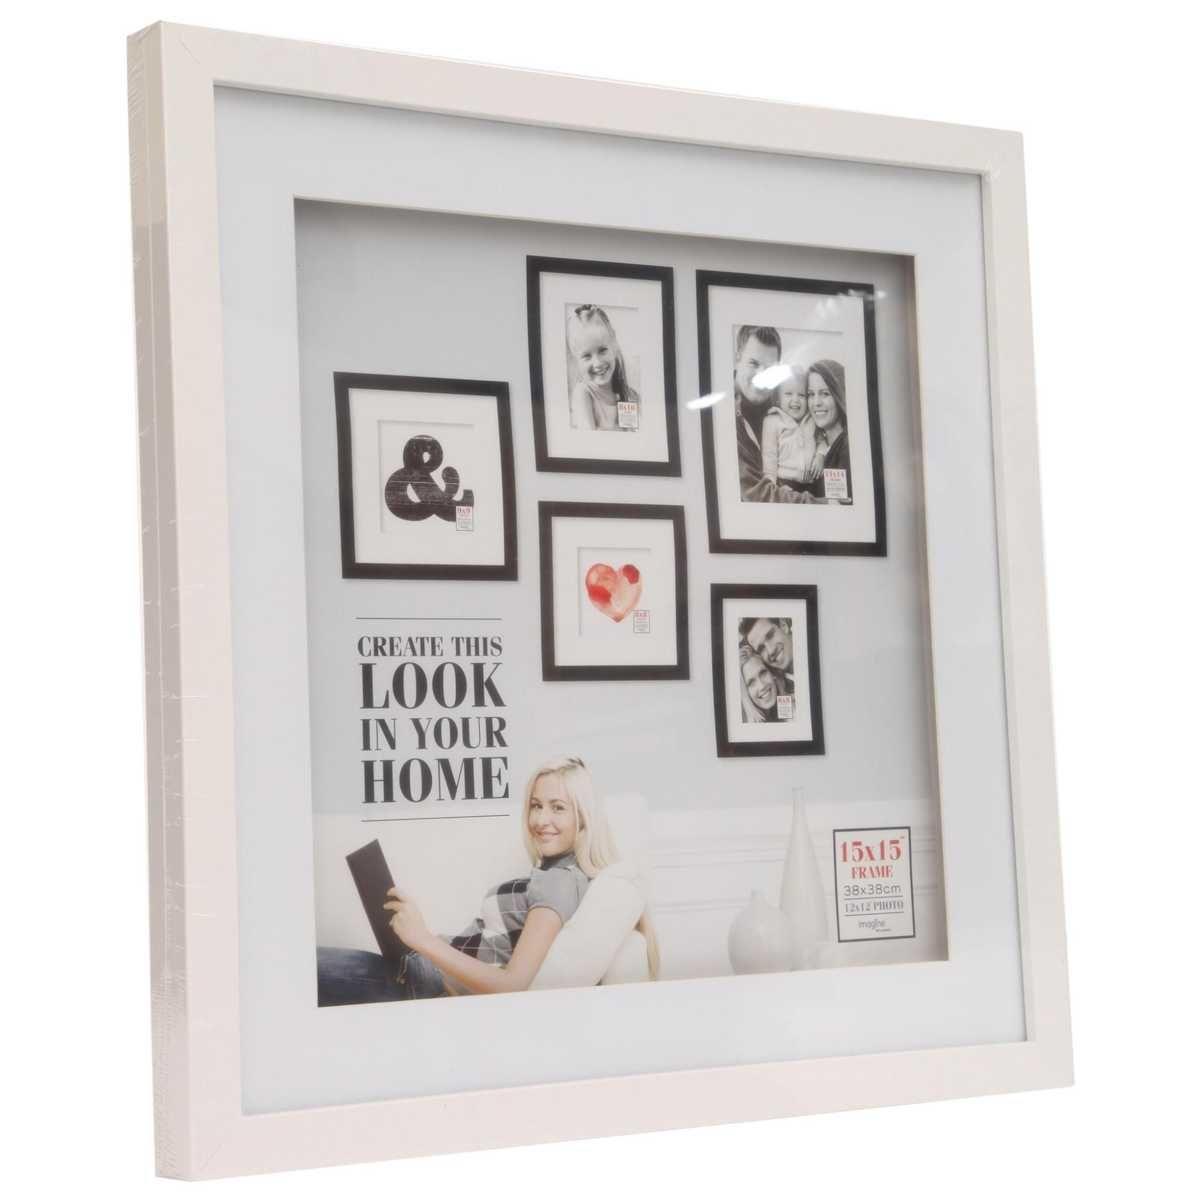 15x15 picture frame images craft decoration ideas imagine madison now carries the finest photo frames available imagine madison now carries the finest photo jeuxipadfo Choice Image